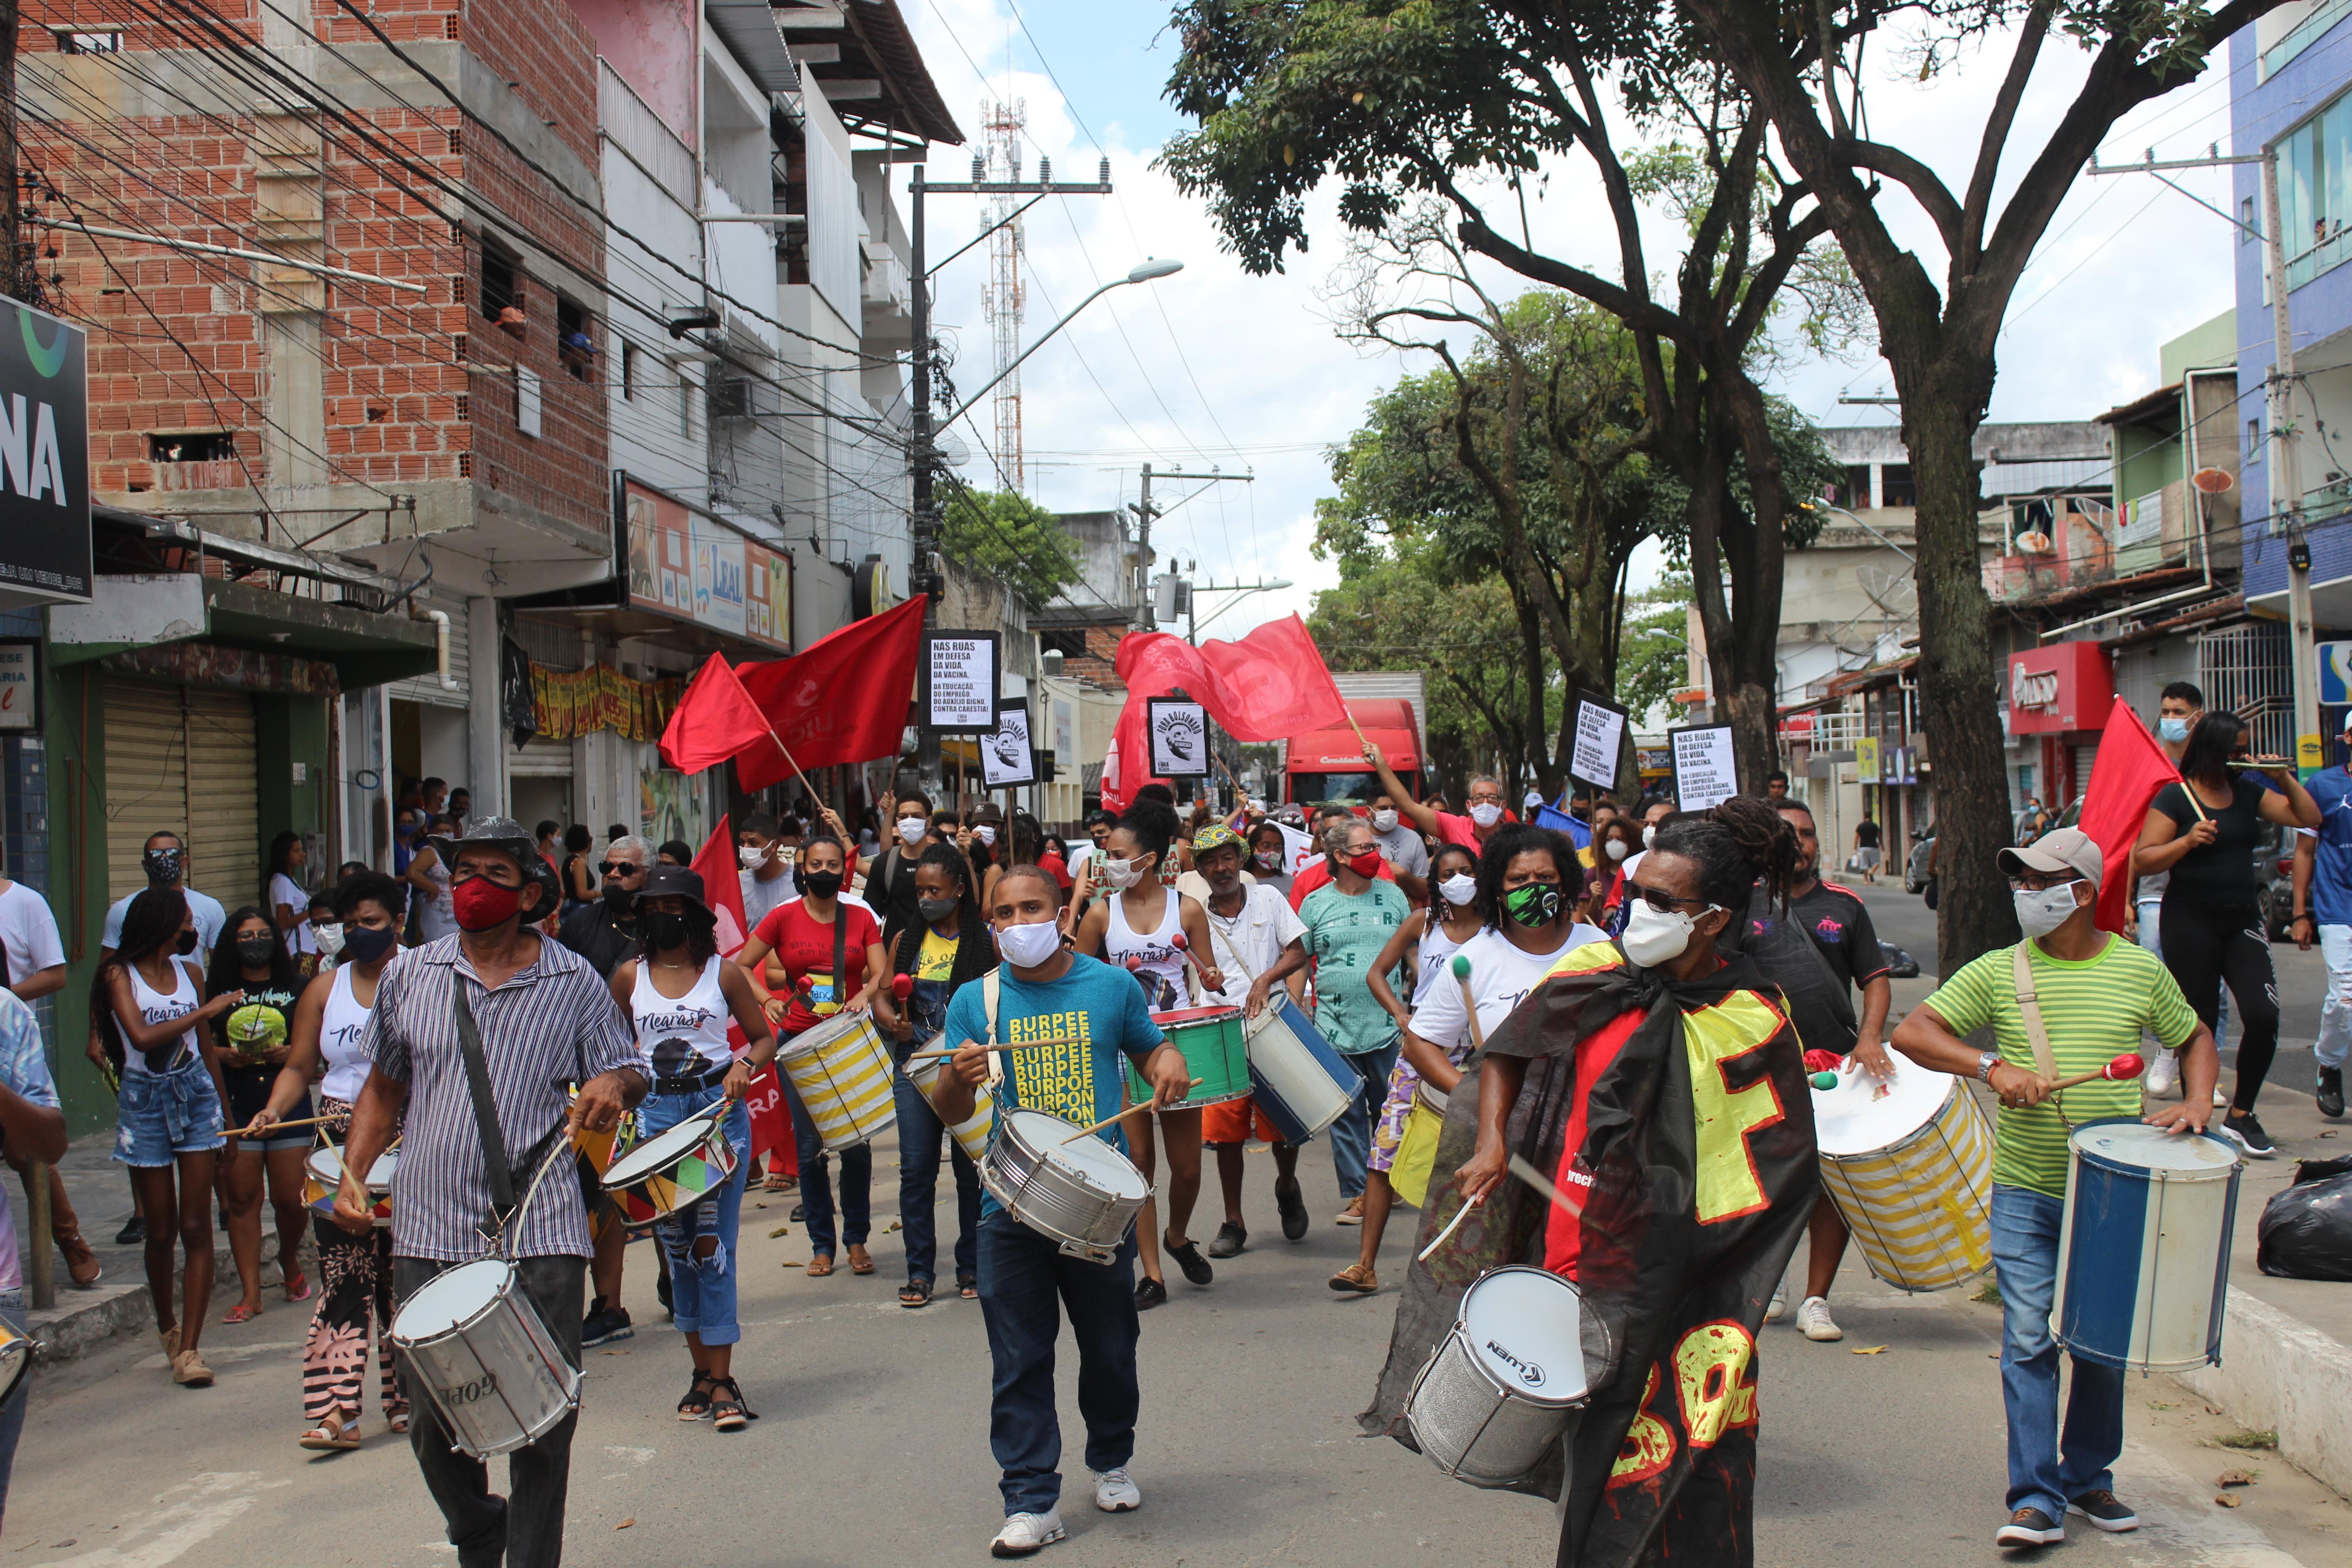 Itabuna: 7 de setembro de luta contra o governo Bolsonaro